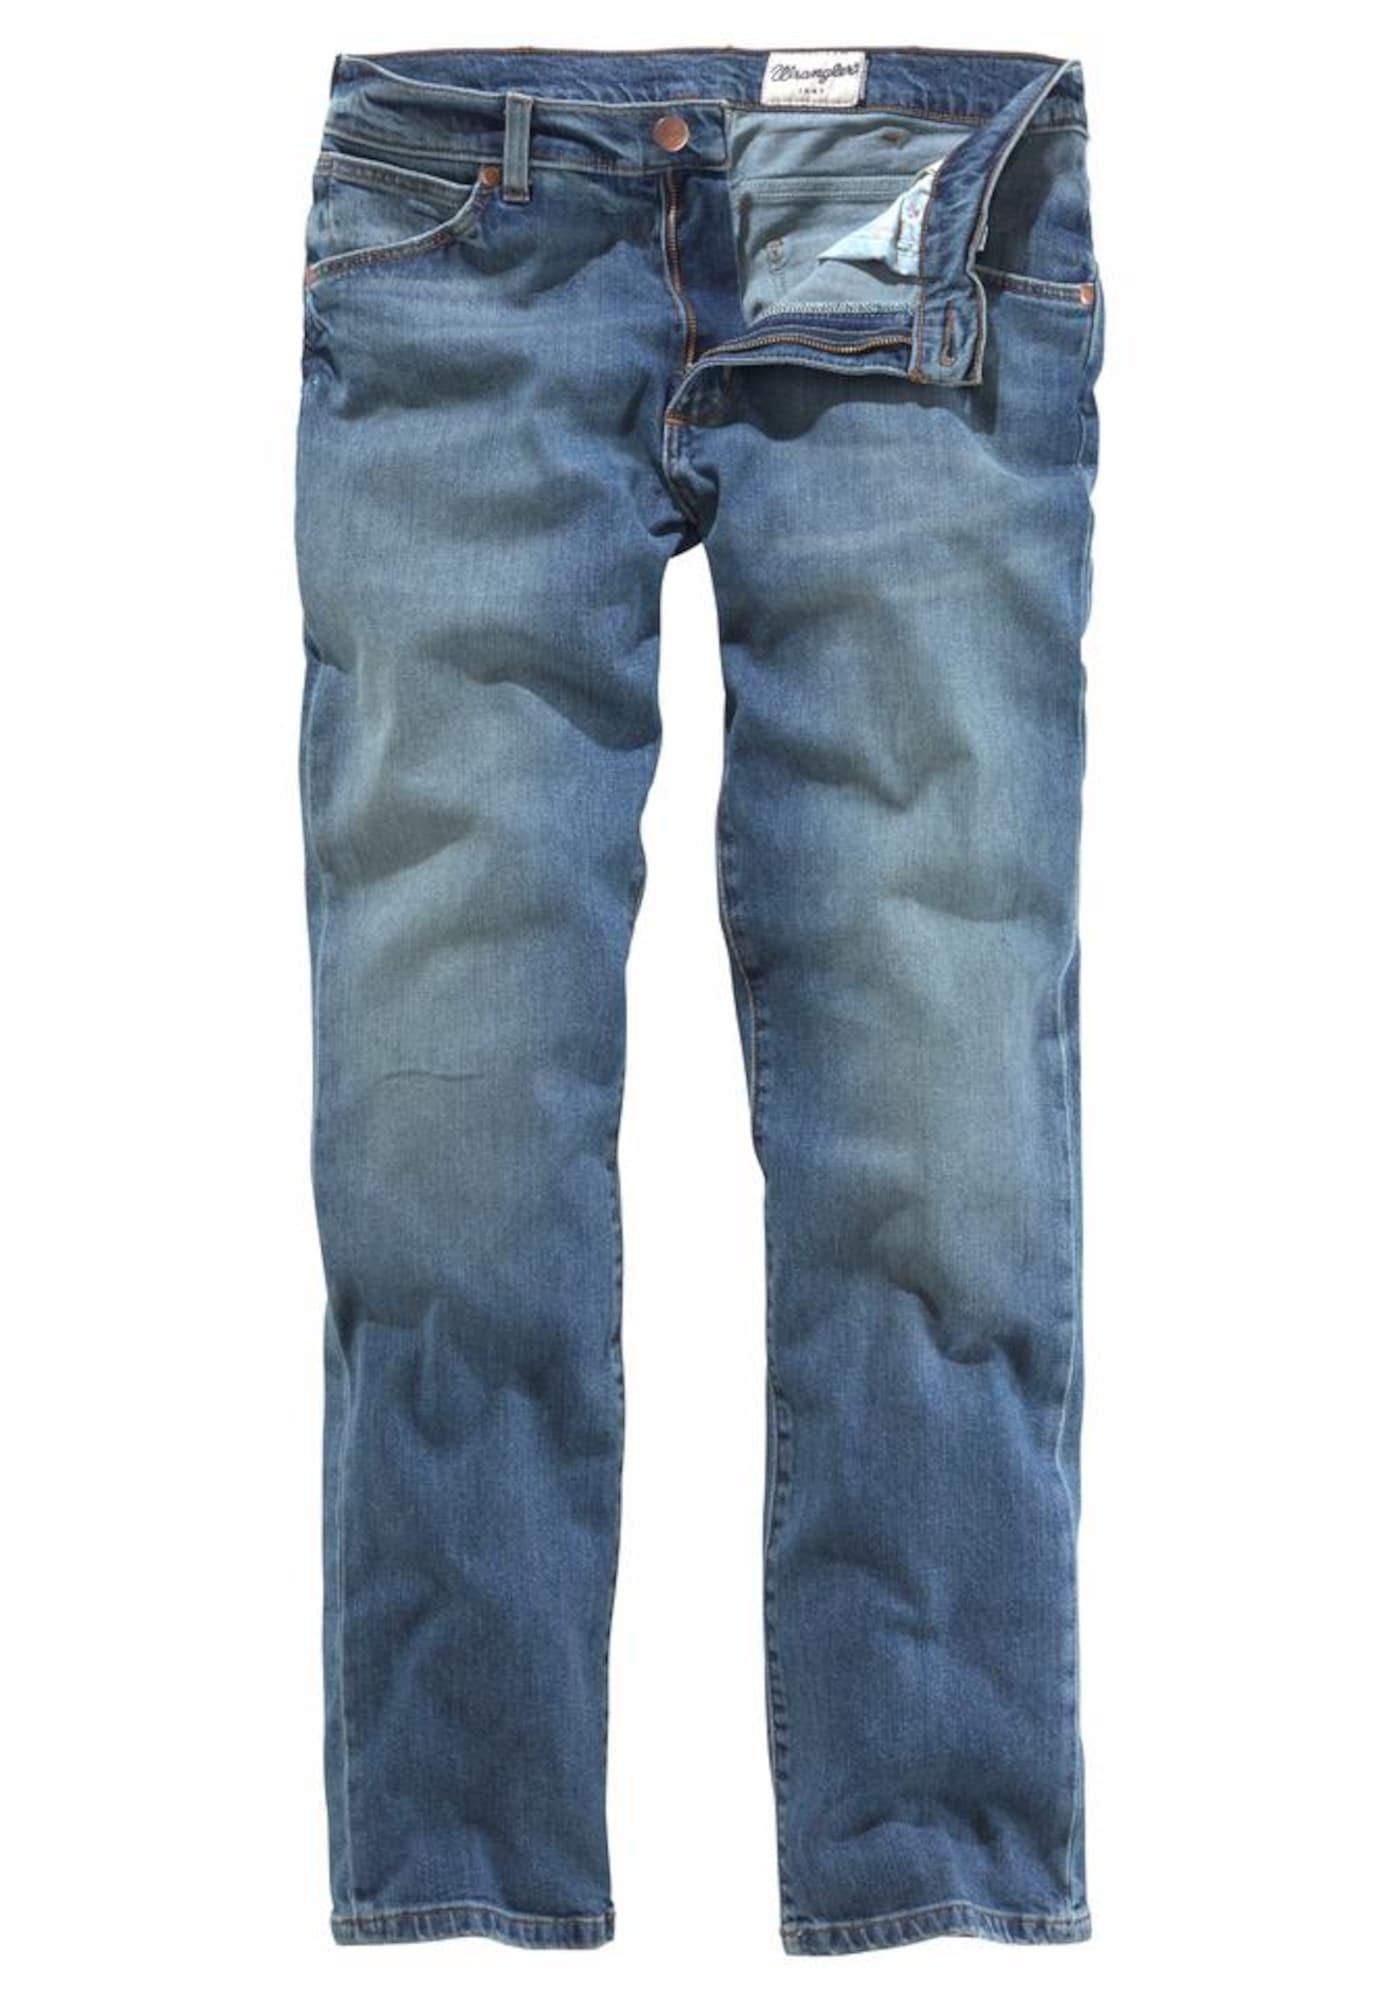 WRANGLER Heren Jeans Greensboro blauw